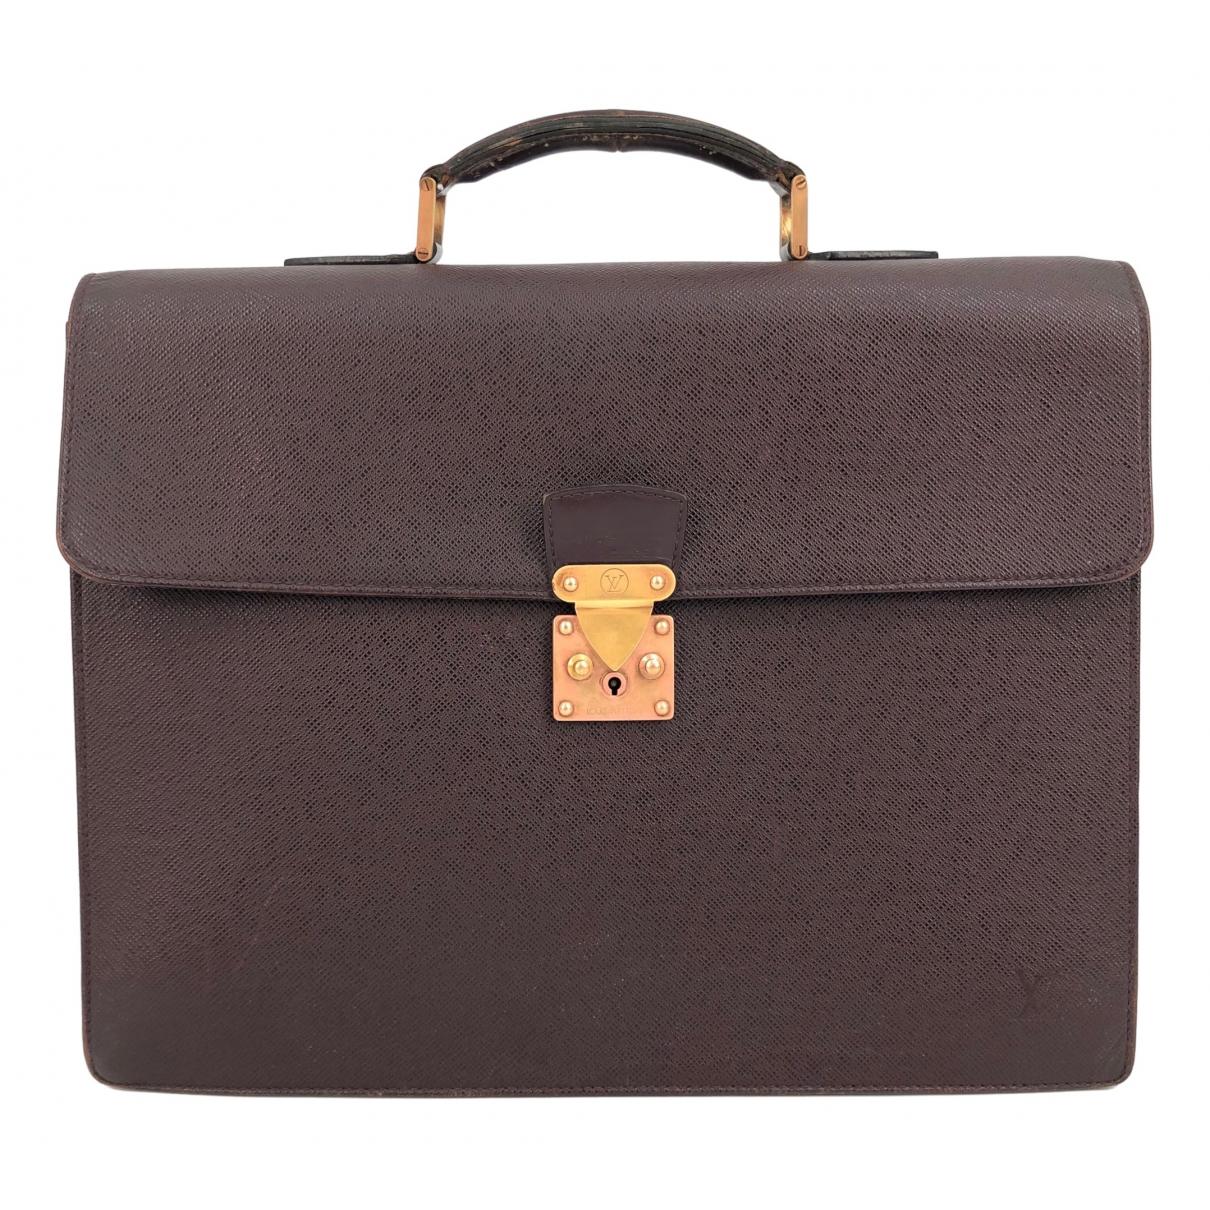 Louis Vuitton N Brown Leather bag for Men N